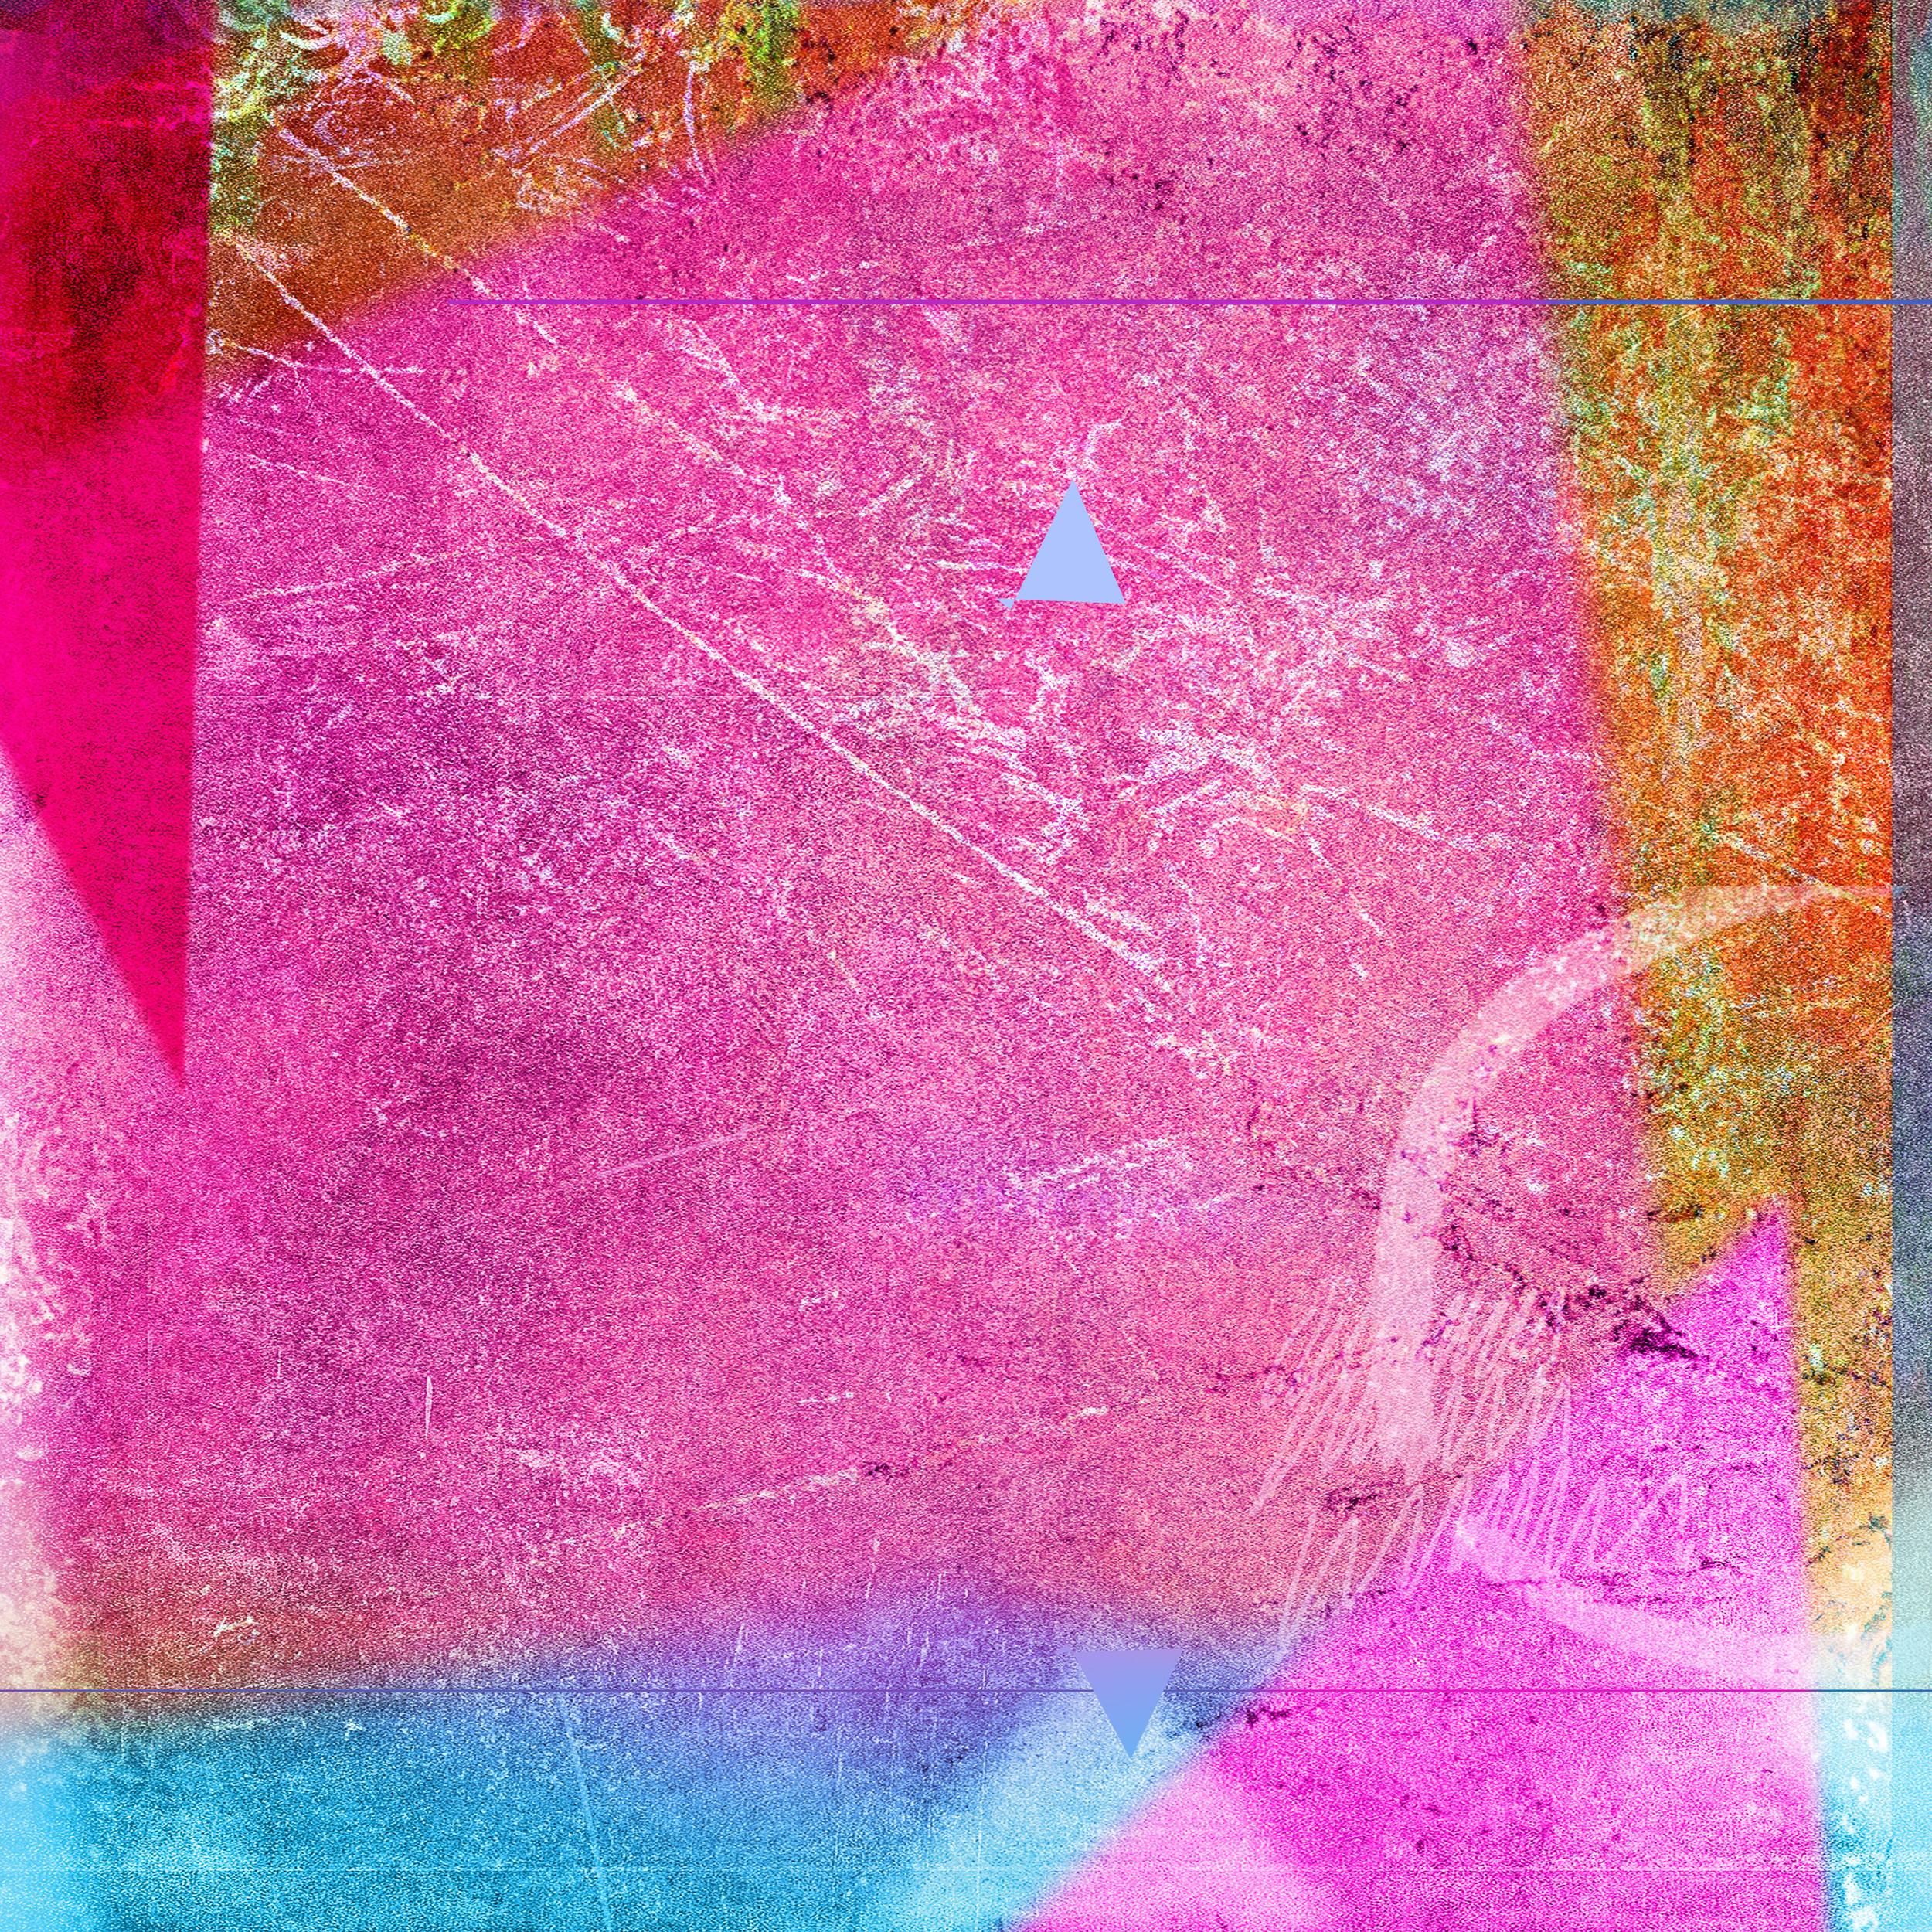 Richard Quinn Painting_Rust_2_Pink.jpg